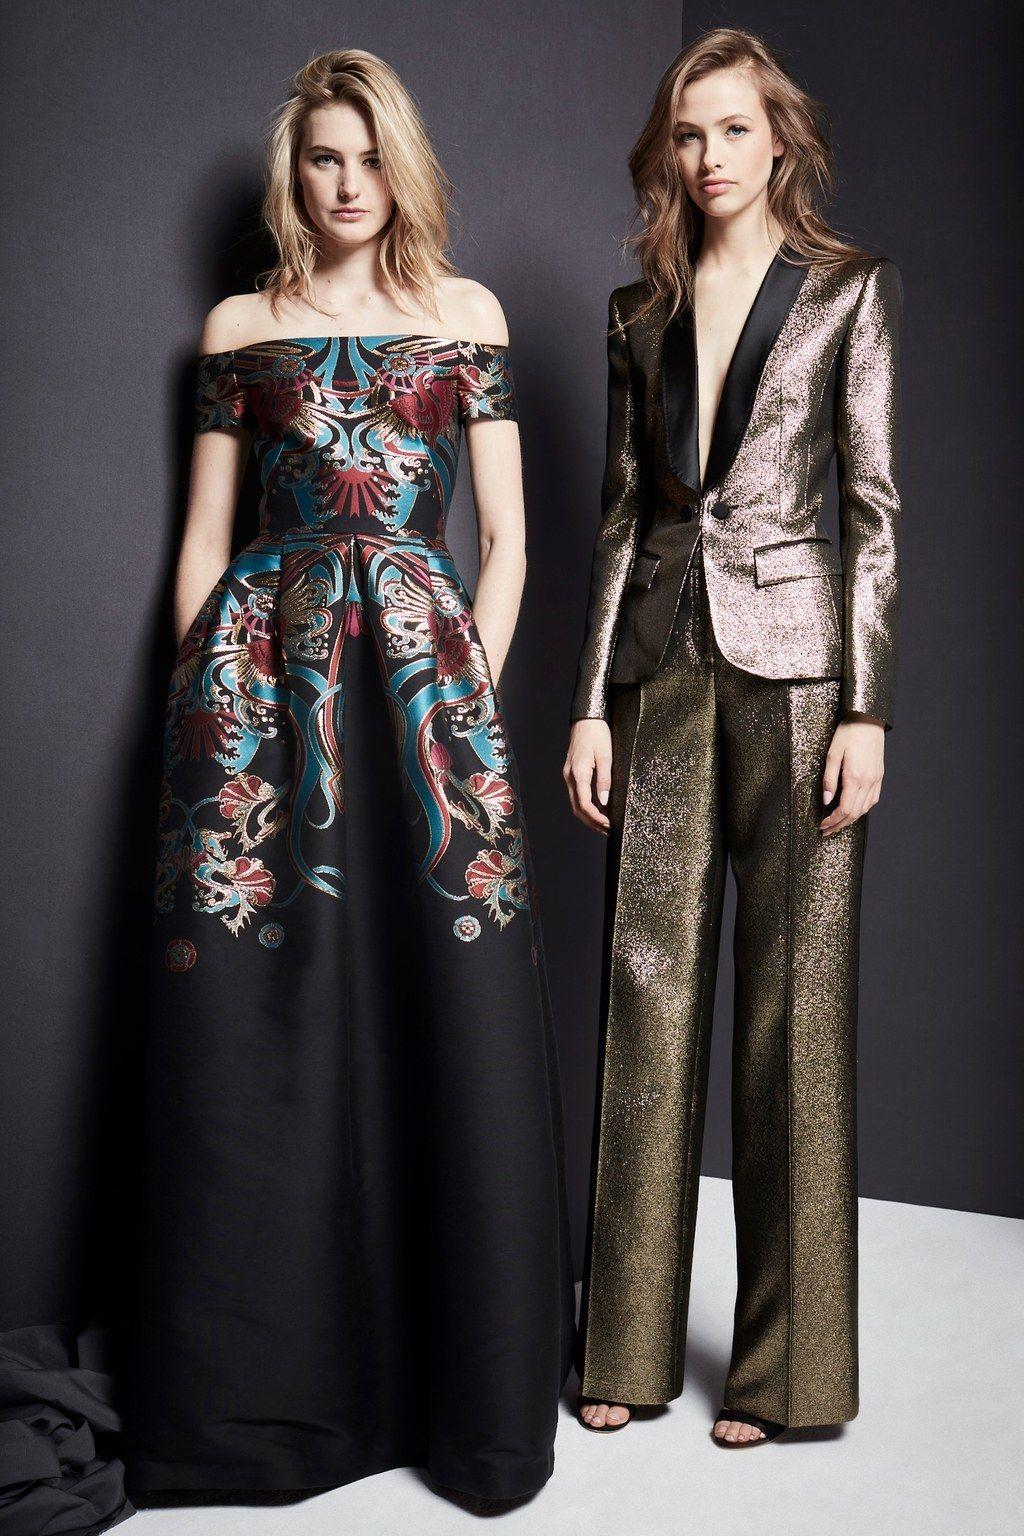 Pin by Vanda Desiree on ♡Zuhair Murad | Couture fashion ...